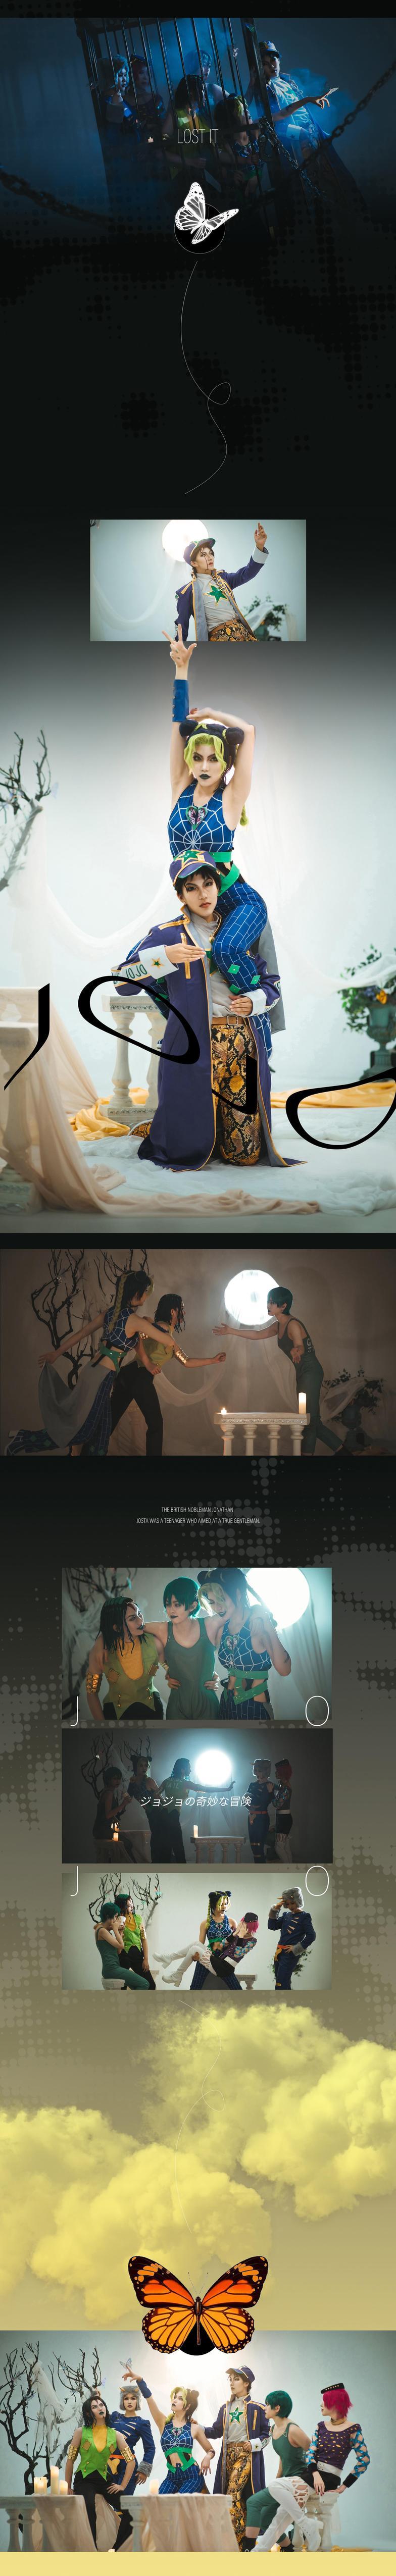 《JOJO的奇妙冒险》正片cosplay【CN:H-尚】-第9张